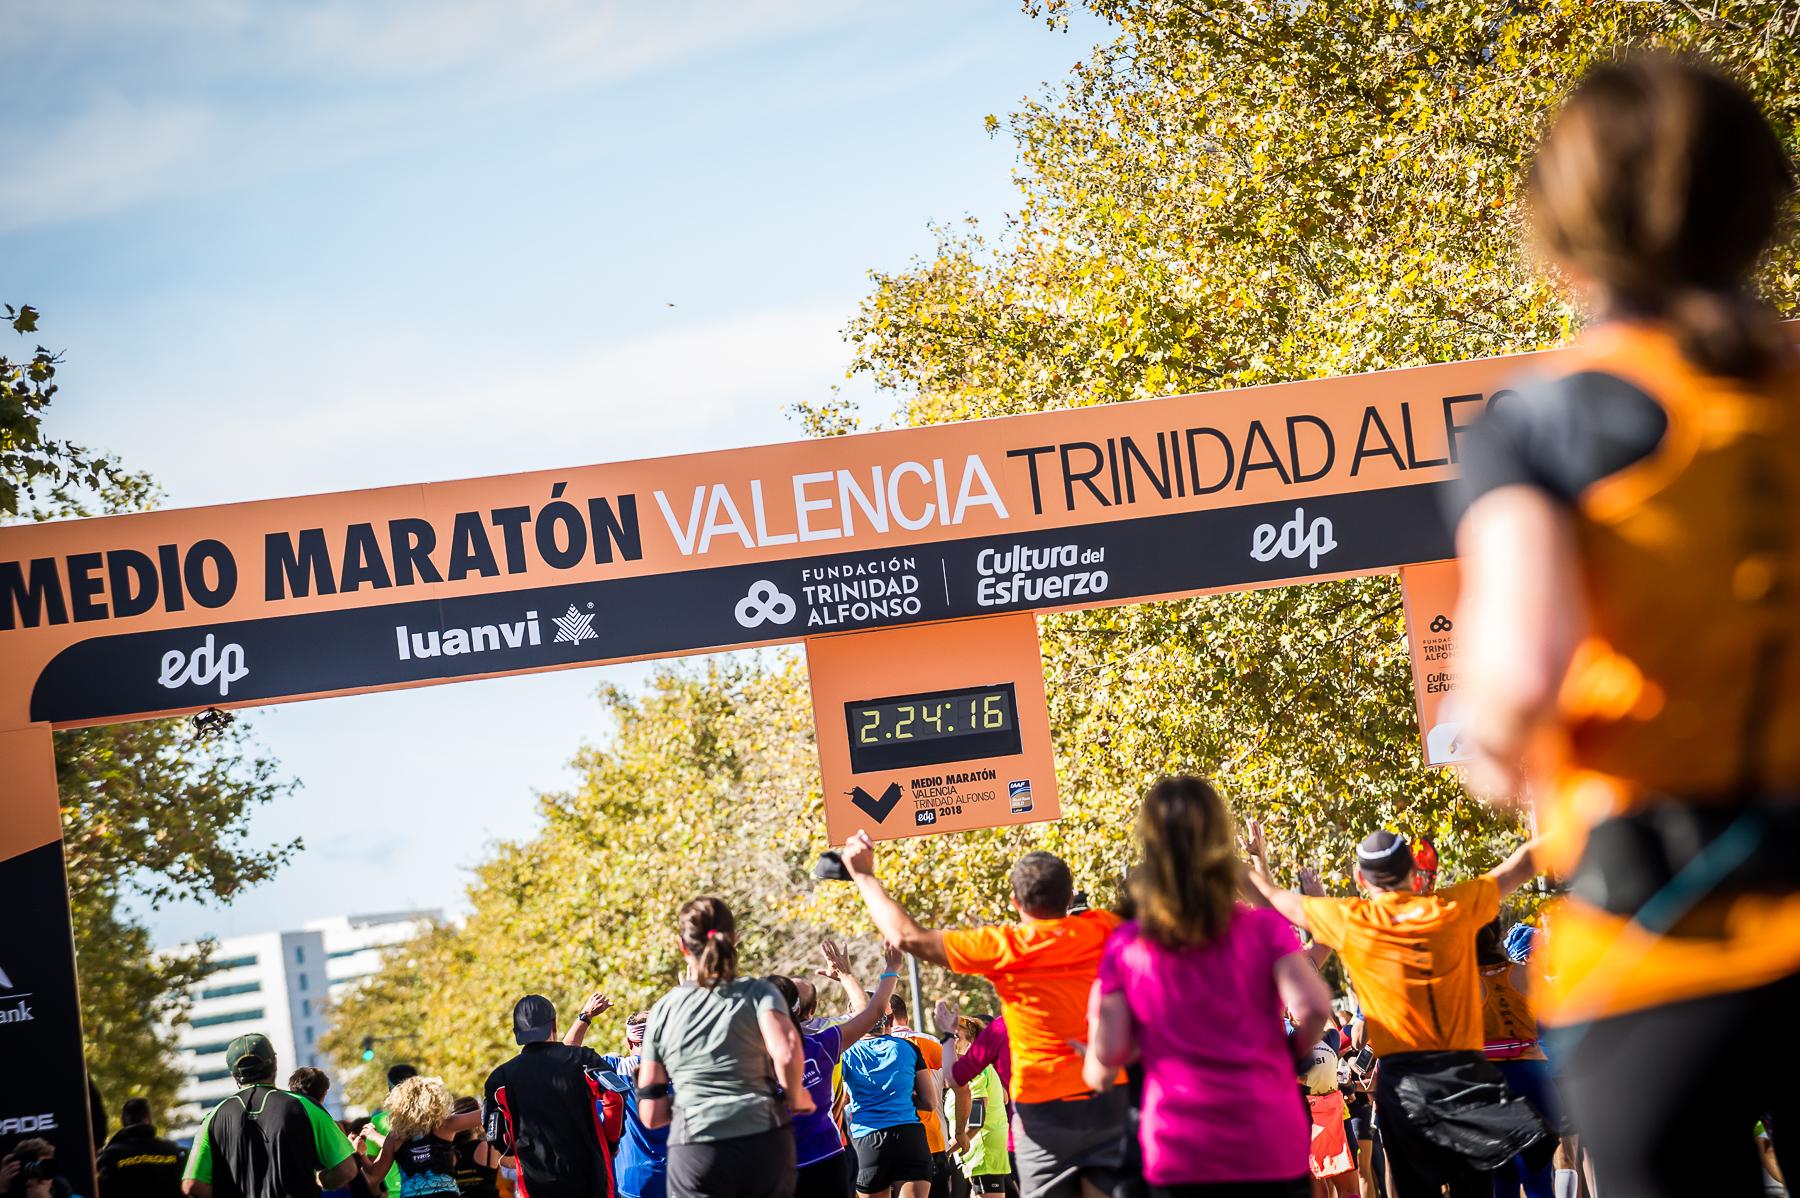 Meta Medio Maraton Valencia